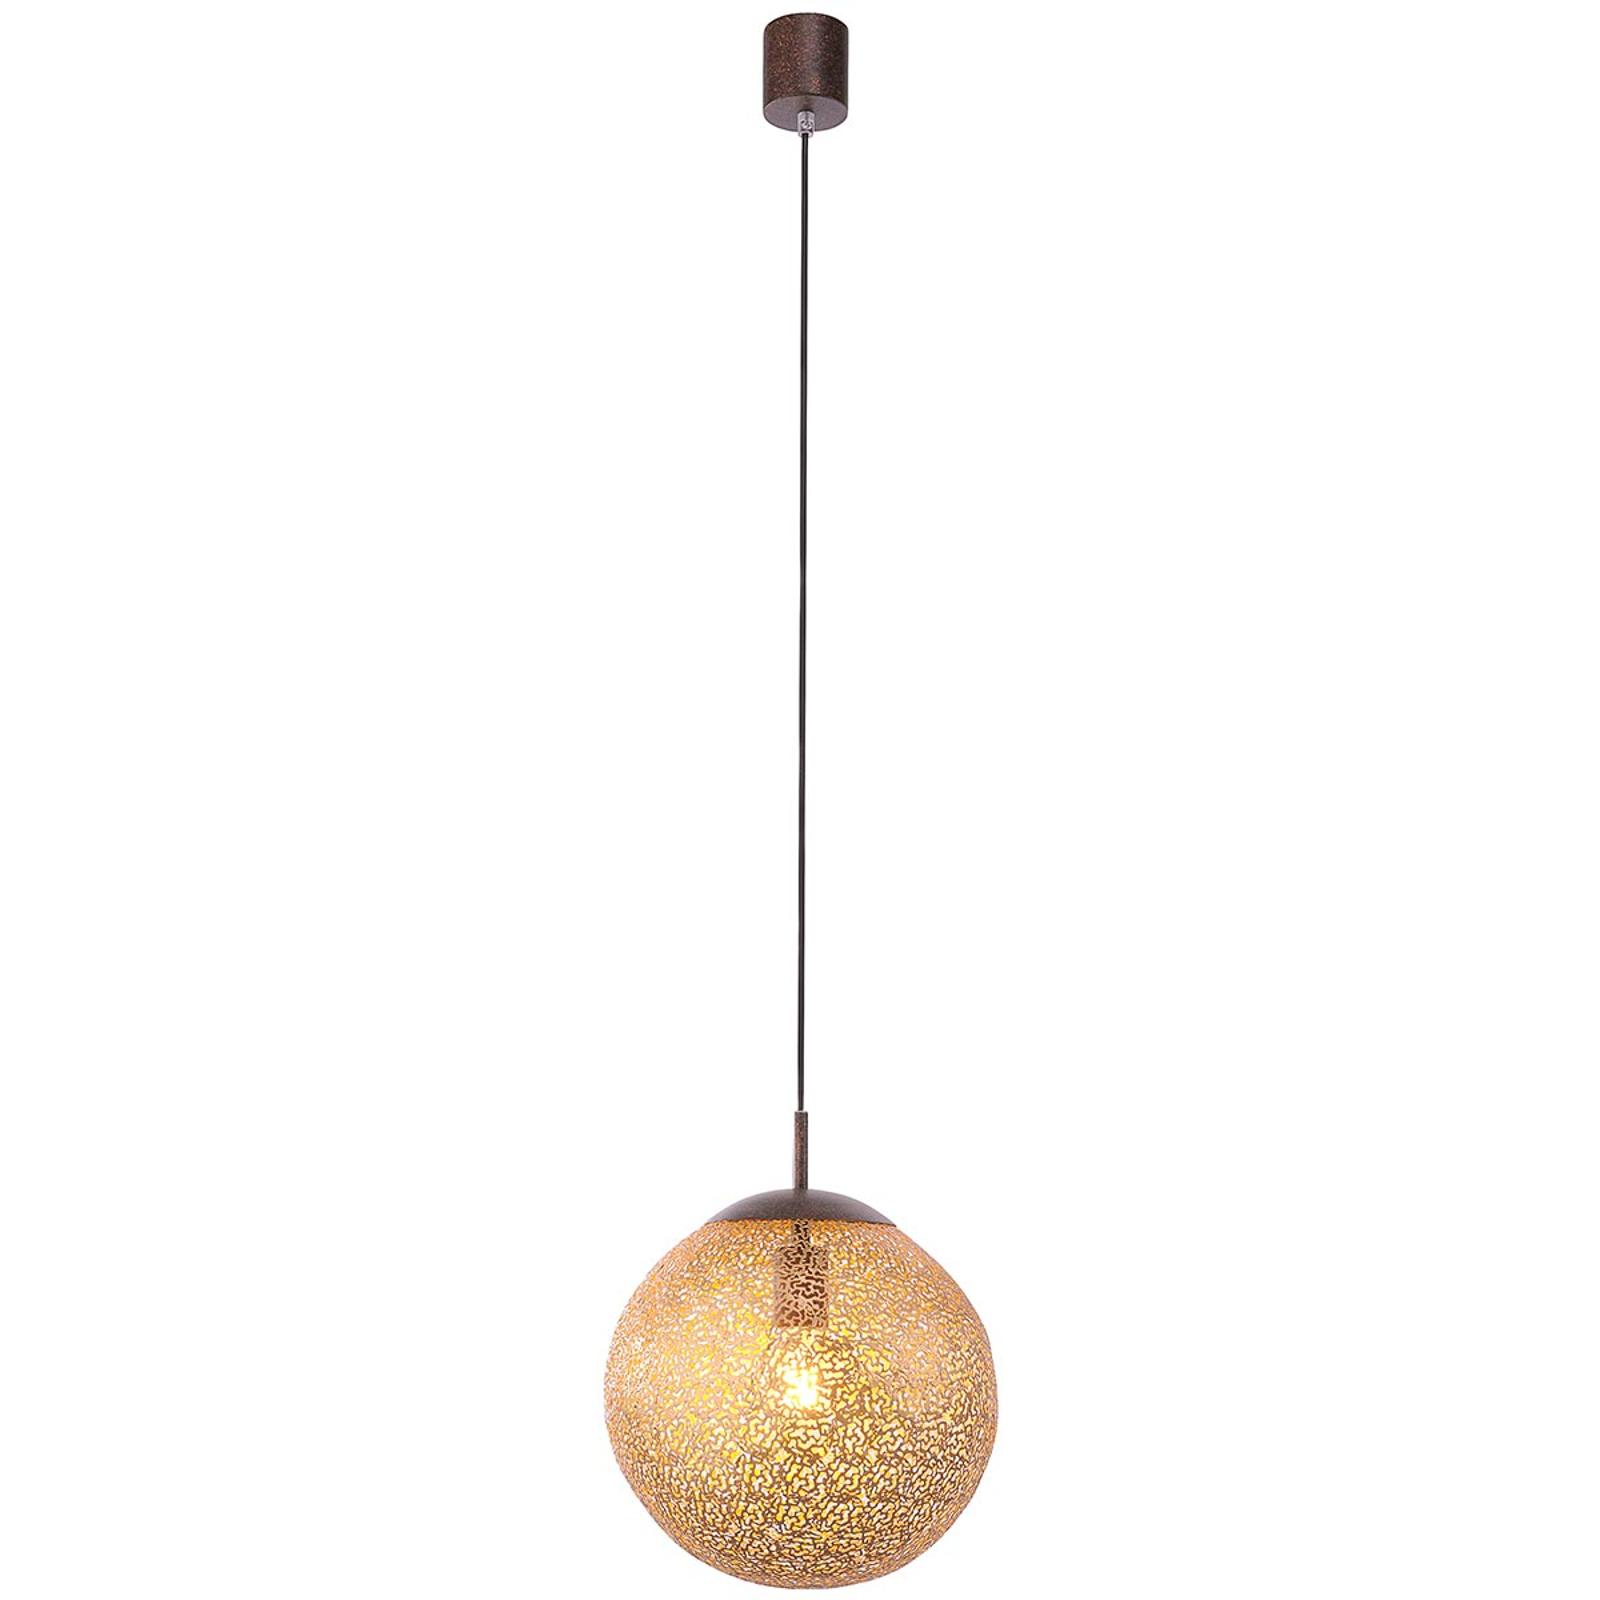 Greta - suspension de couleur or 30 cm